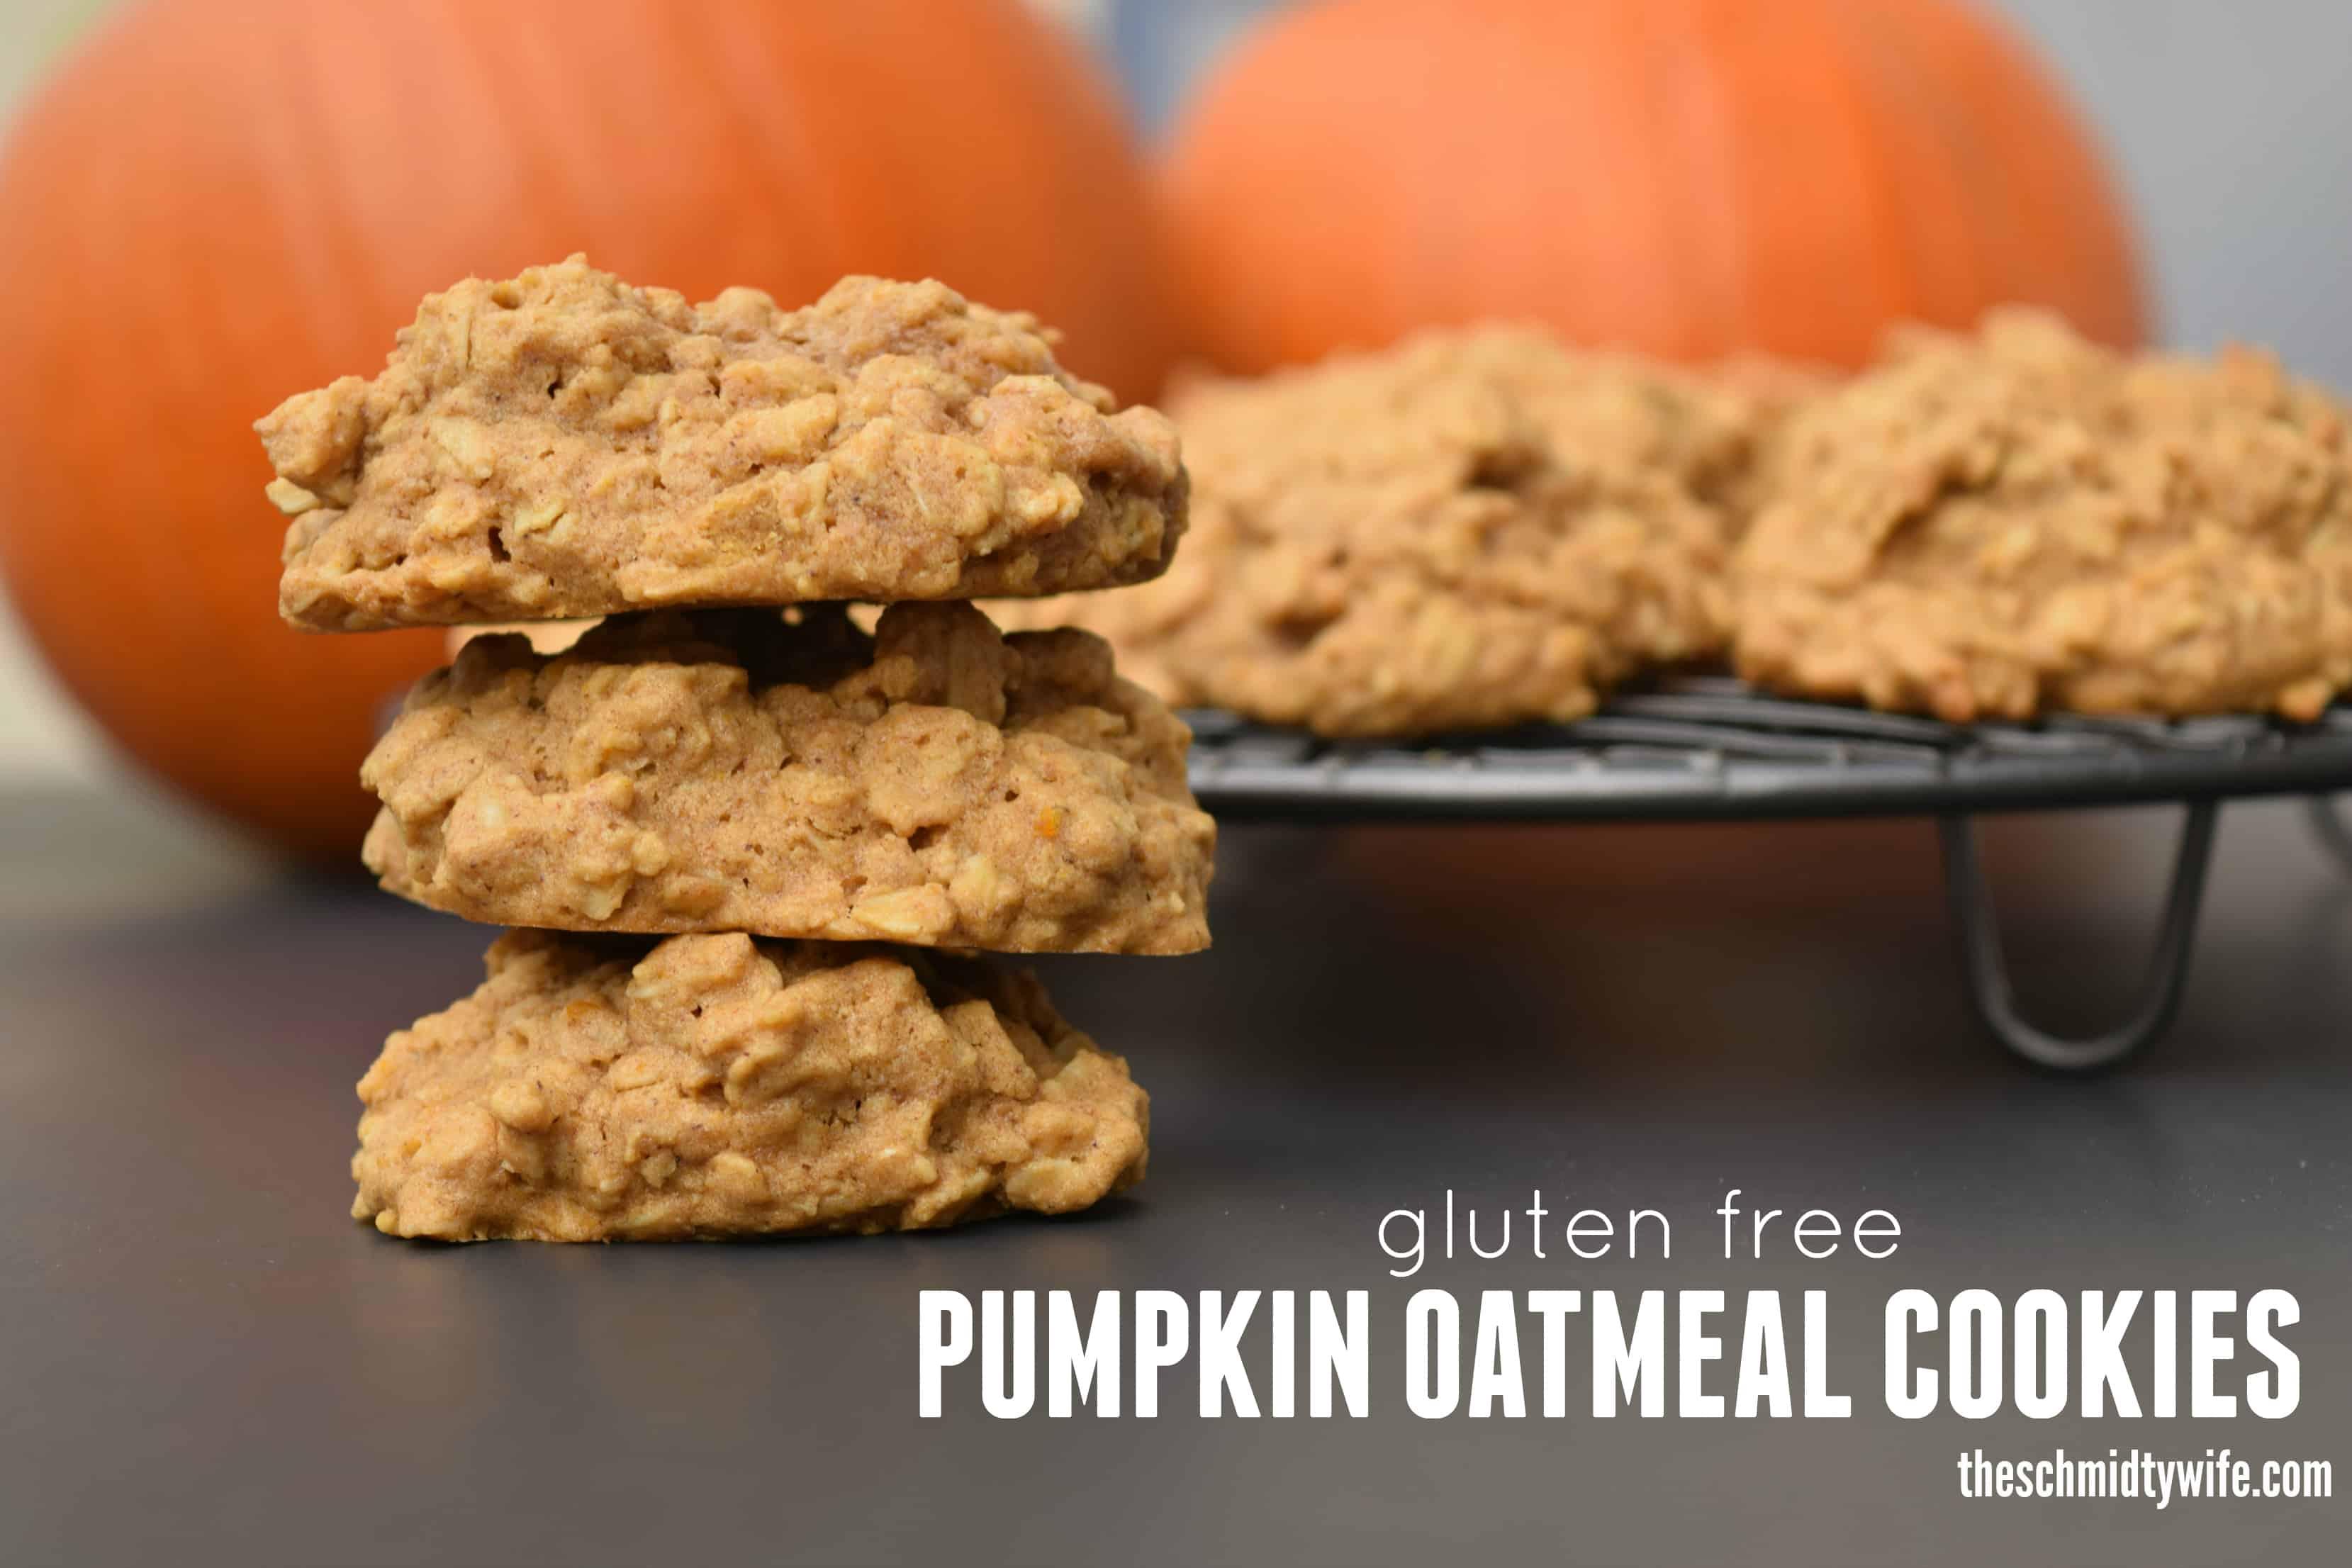 Gluten Free Pumpkin Oatmeal Cookies